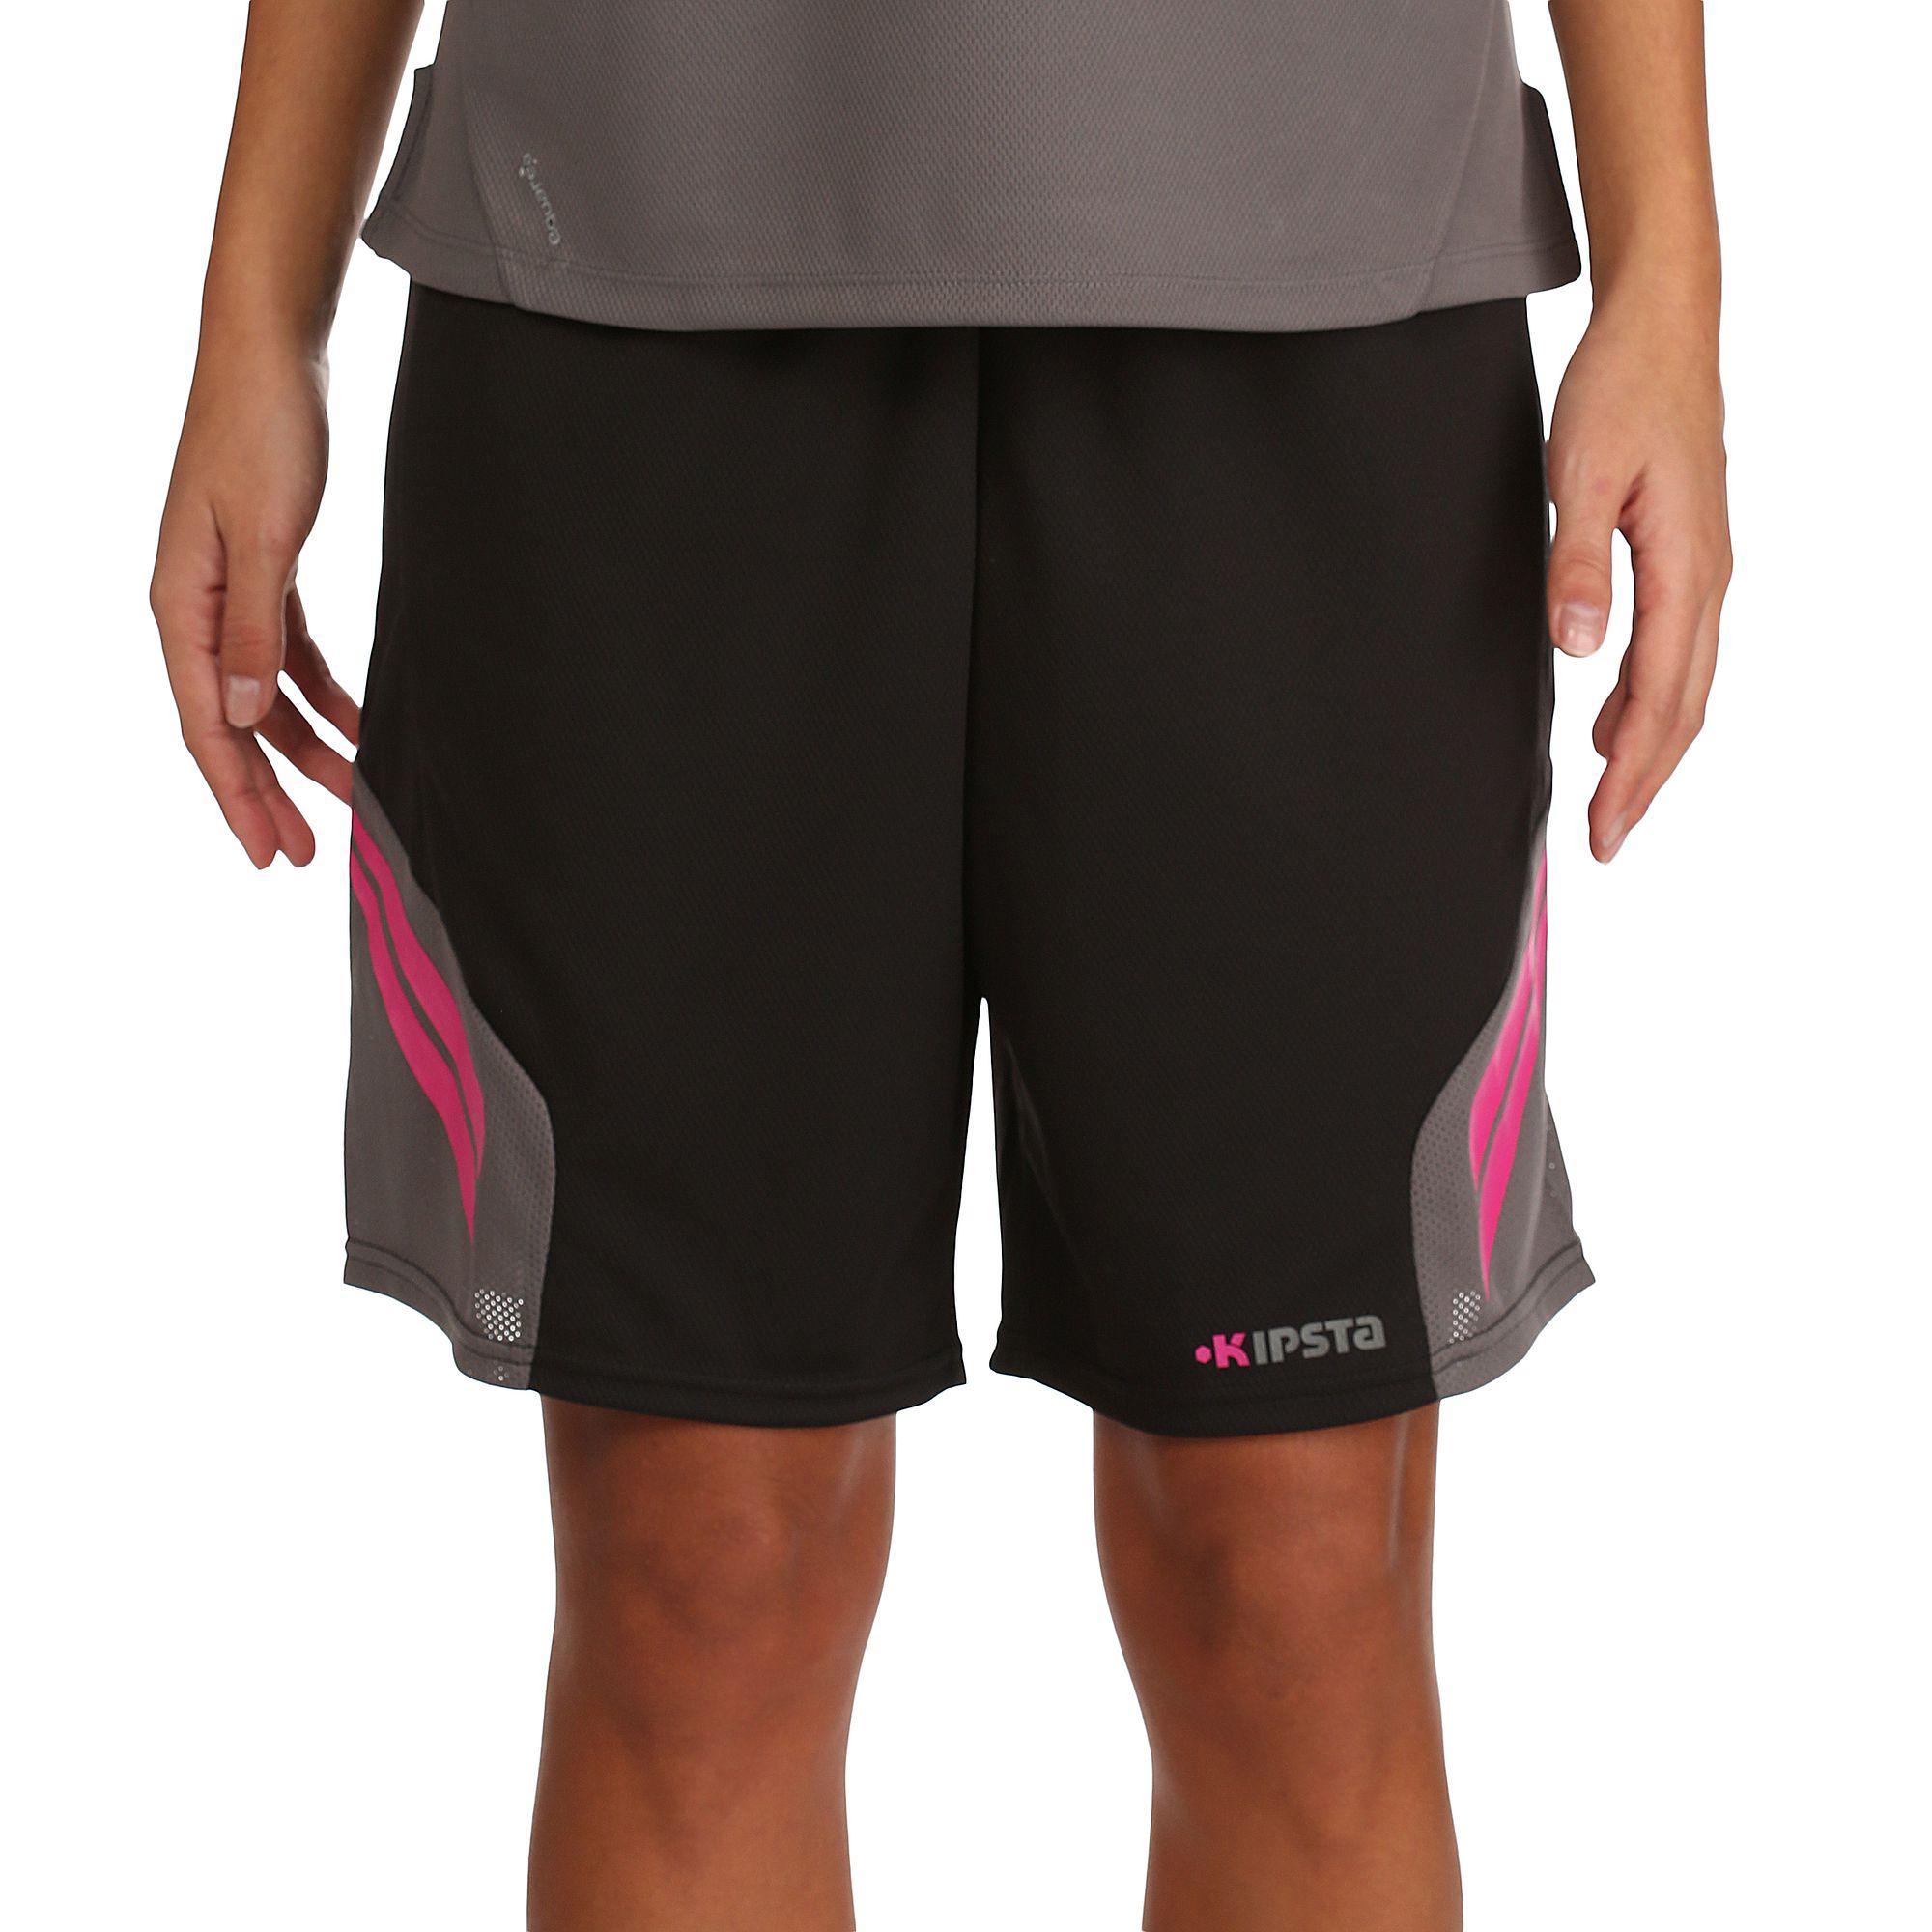 Short de basketball Evo femme gris et rose